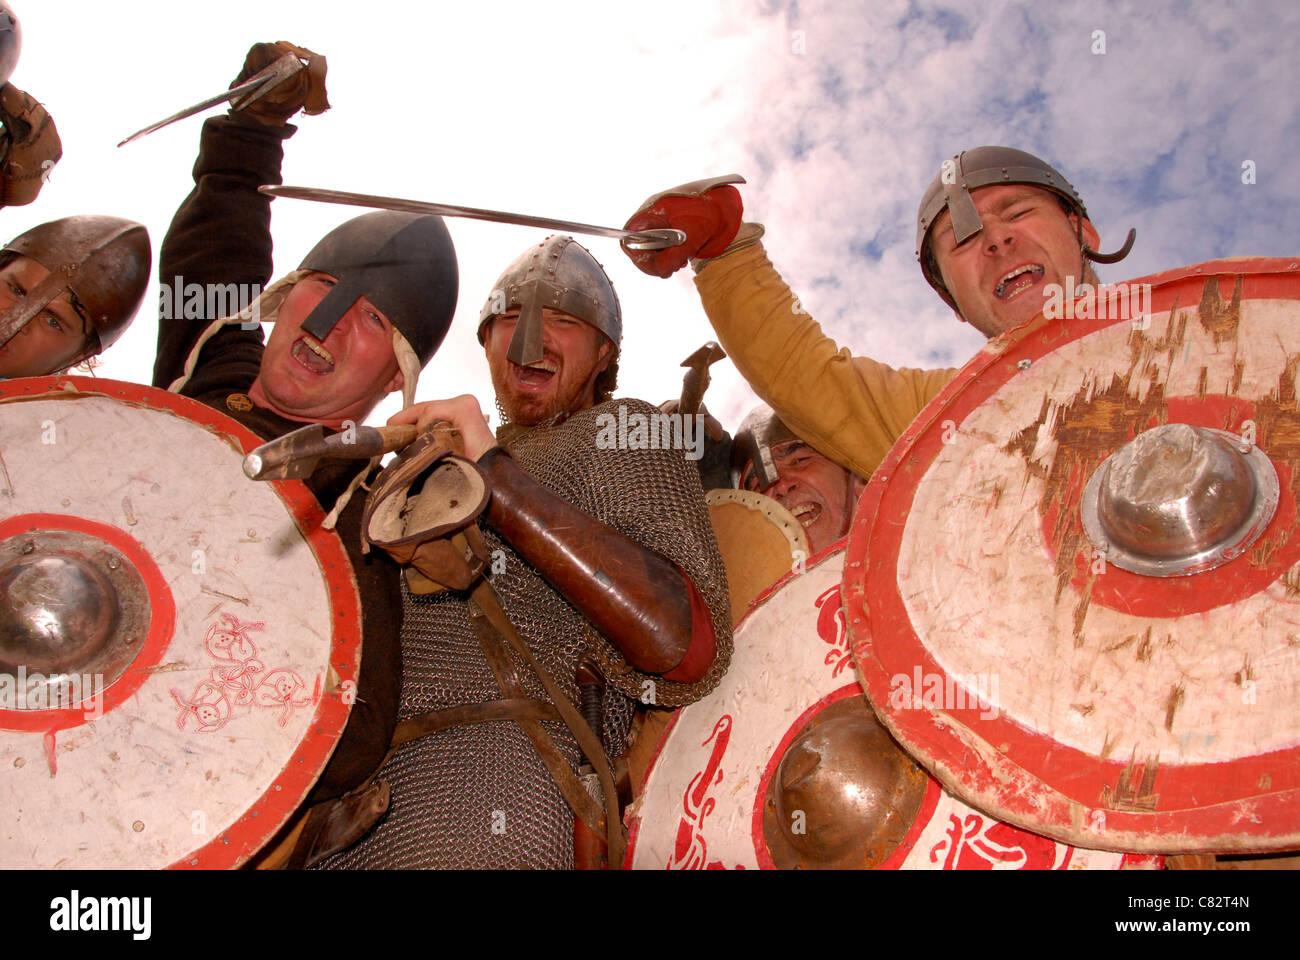 Viking Attack Viking festival Amlwch Anglesey North Wales Uk. - Stock Image